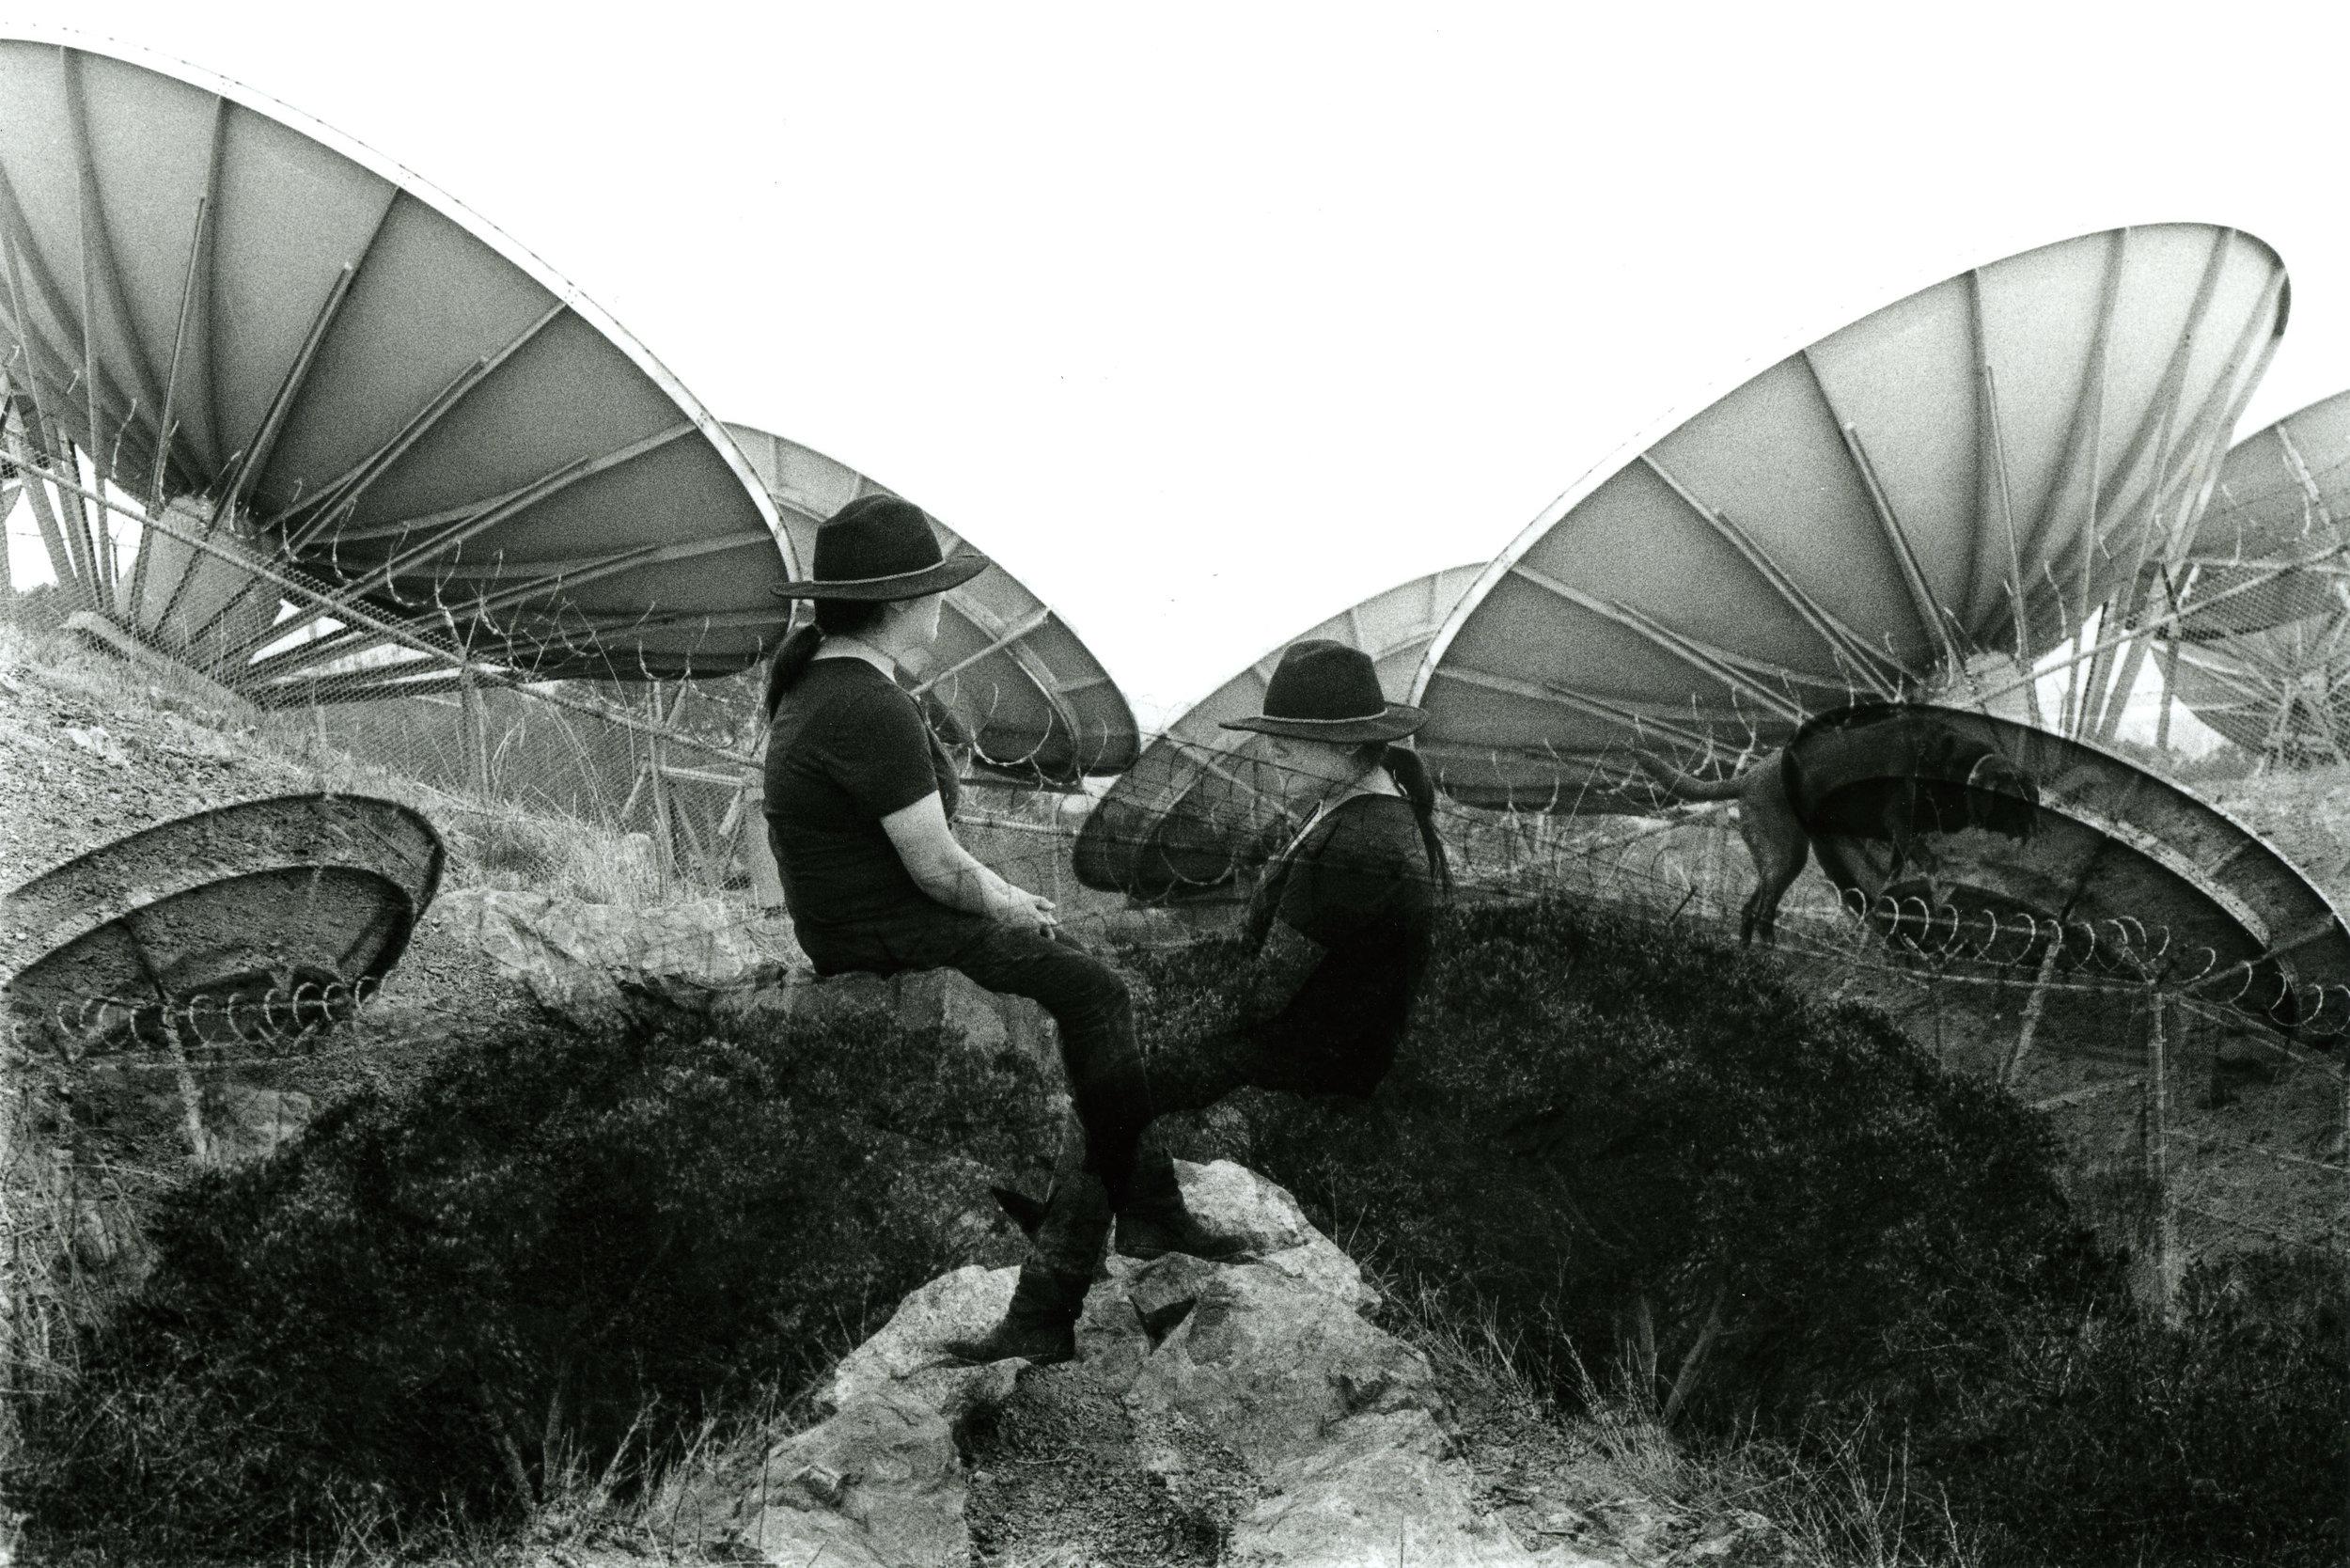 JOSE AGAPAY, MIRACOSTA COLLEGE, GELATIN SILVER PRINT, 2014